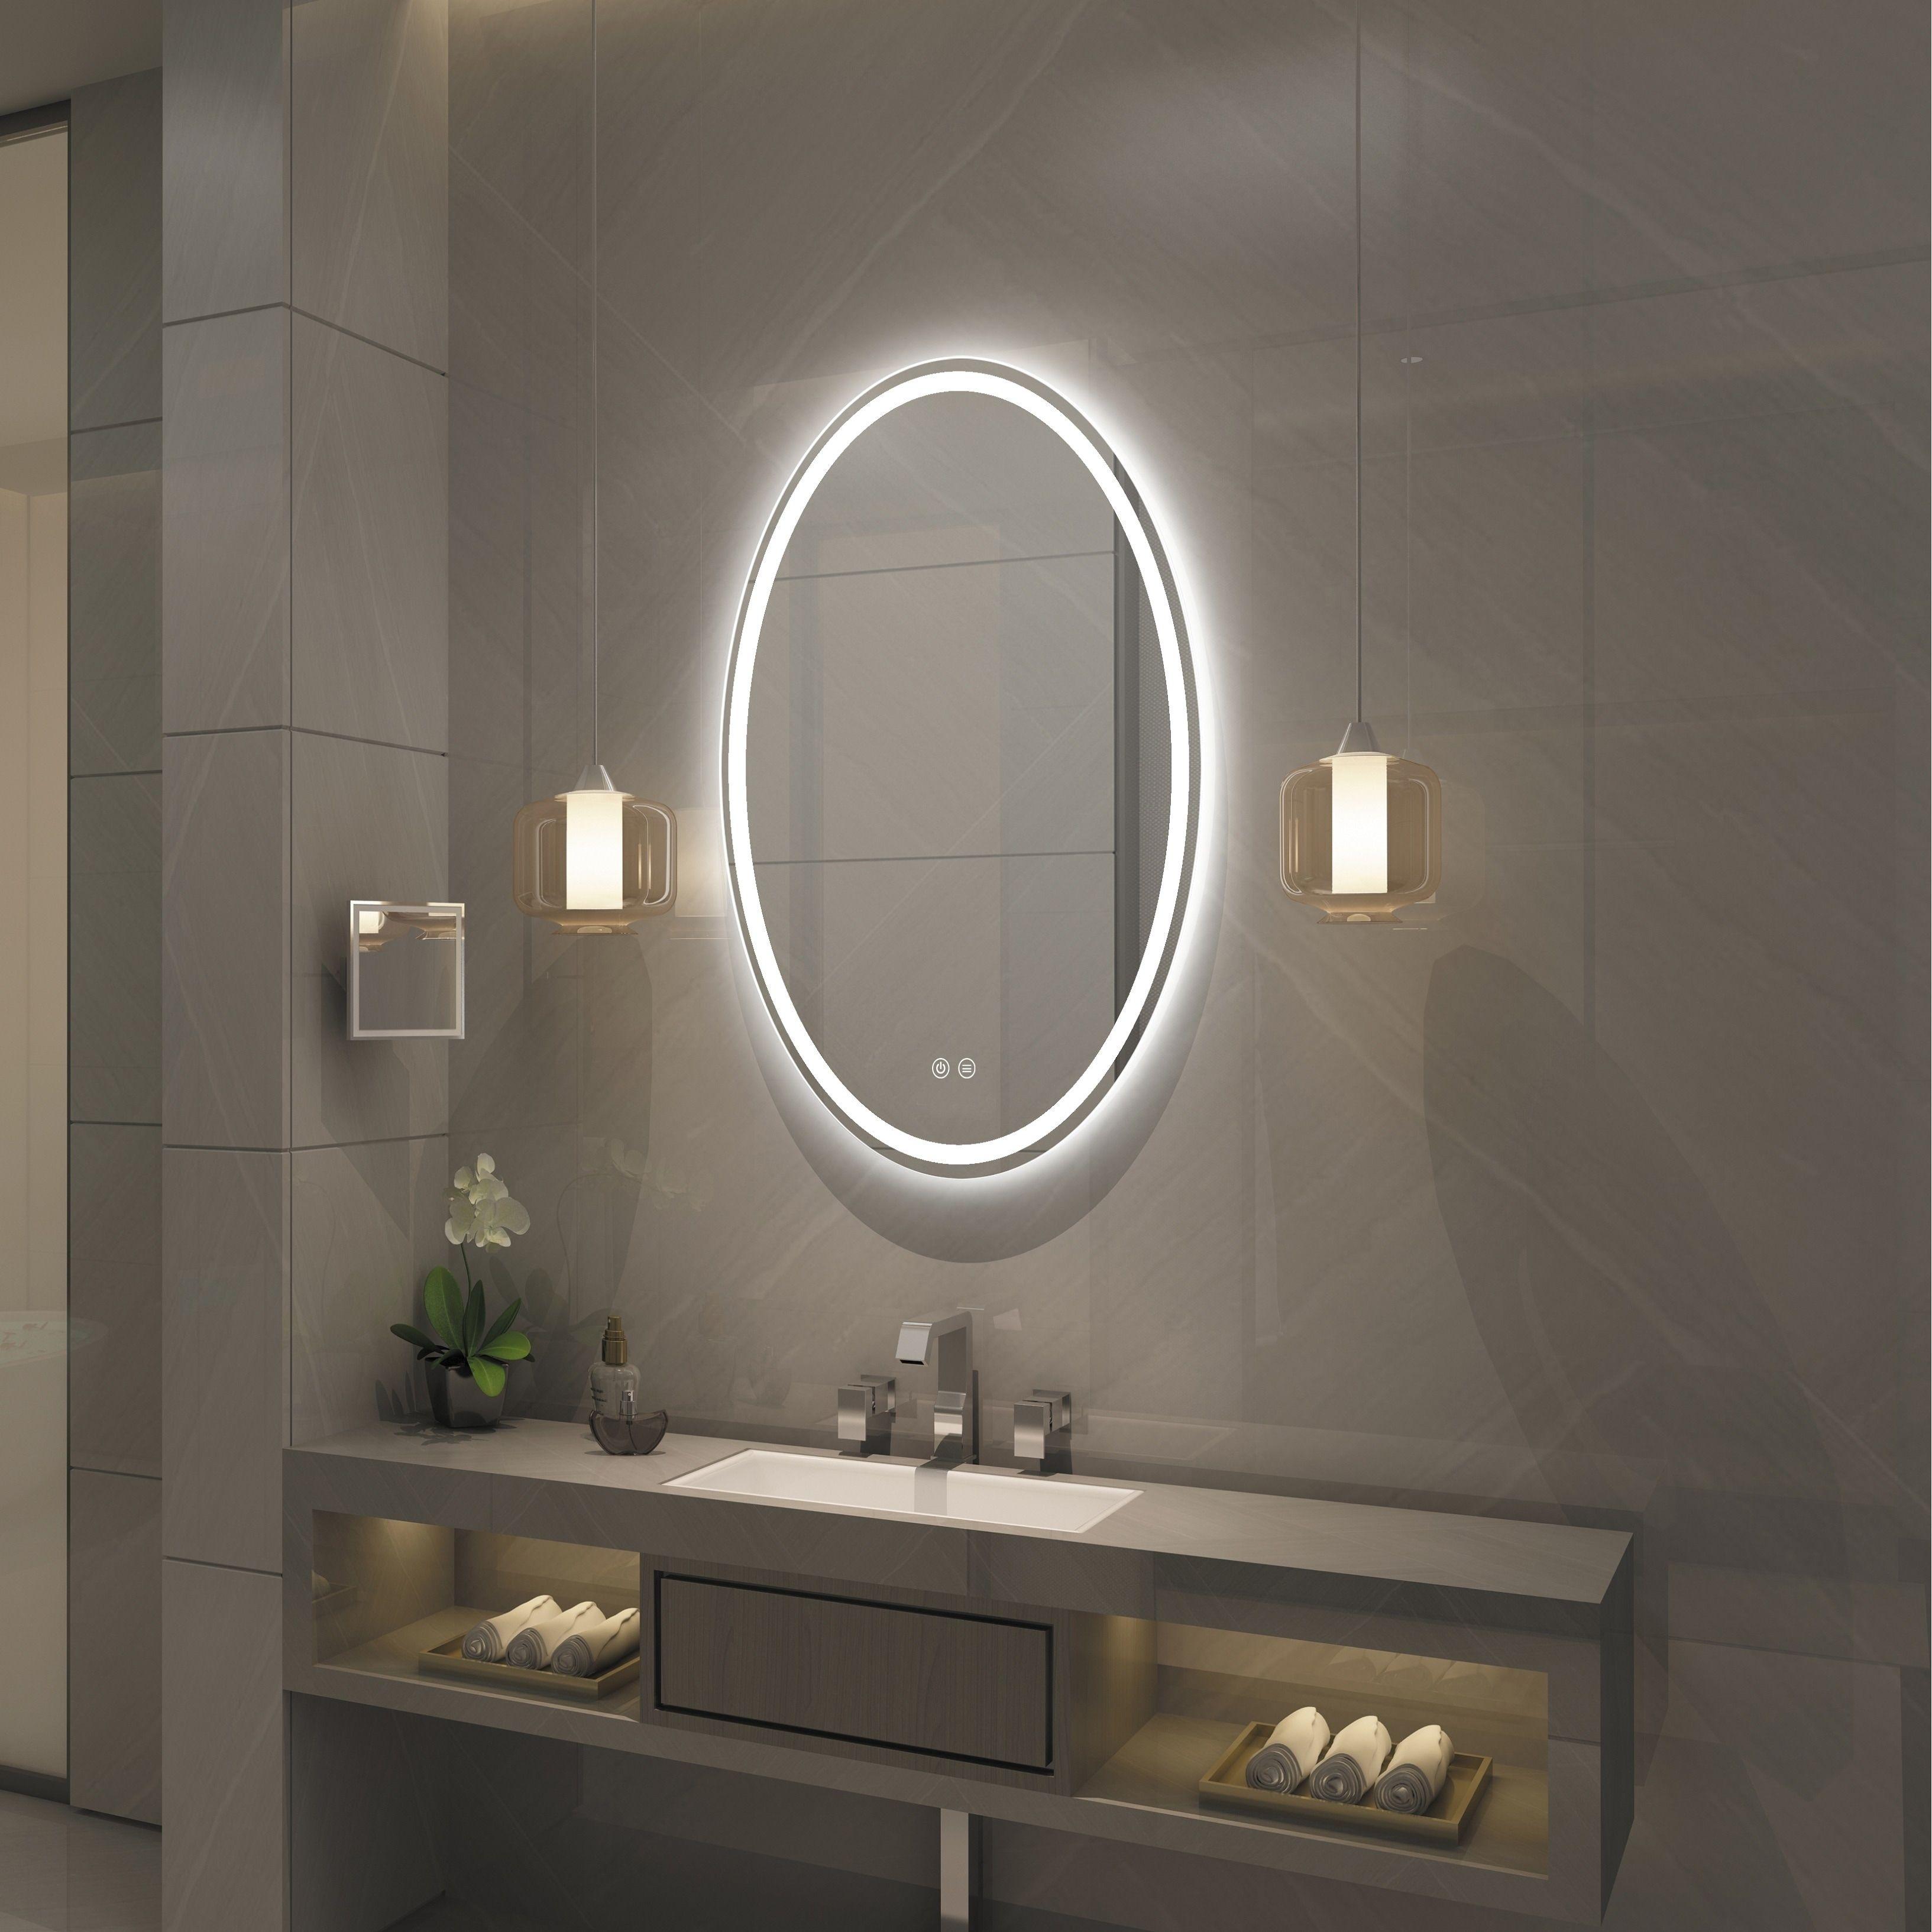 Frameless Wall Mounted Led Bathroom Mirror White Led Mirror Bathroom Led Mirror Bathroom Mirror [ 3267 x 3267 Pixel ]